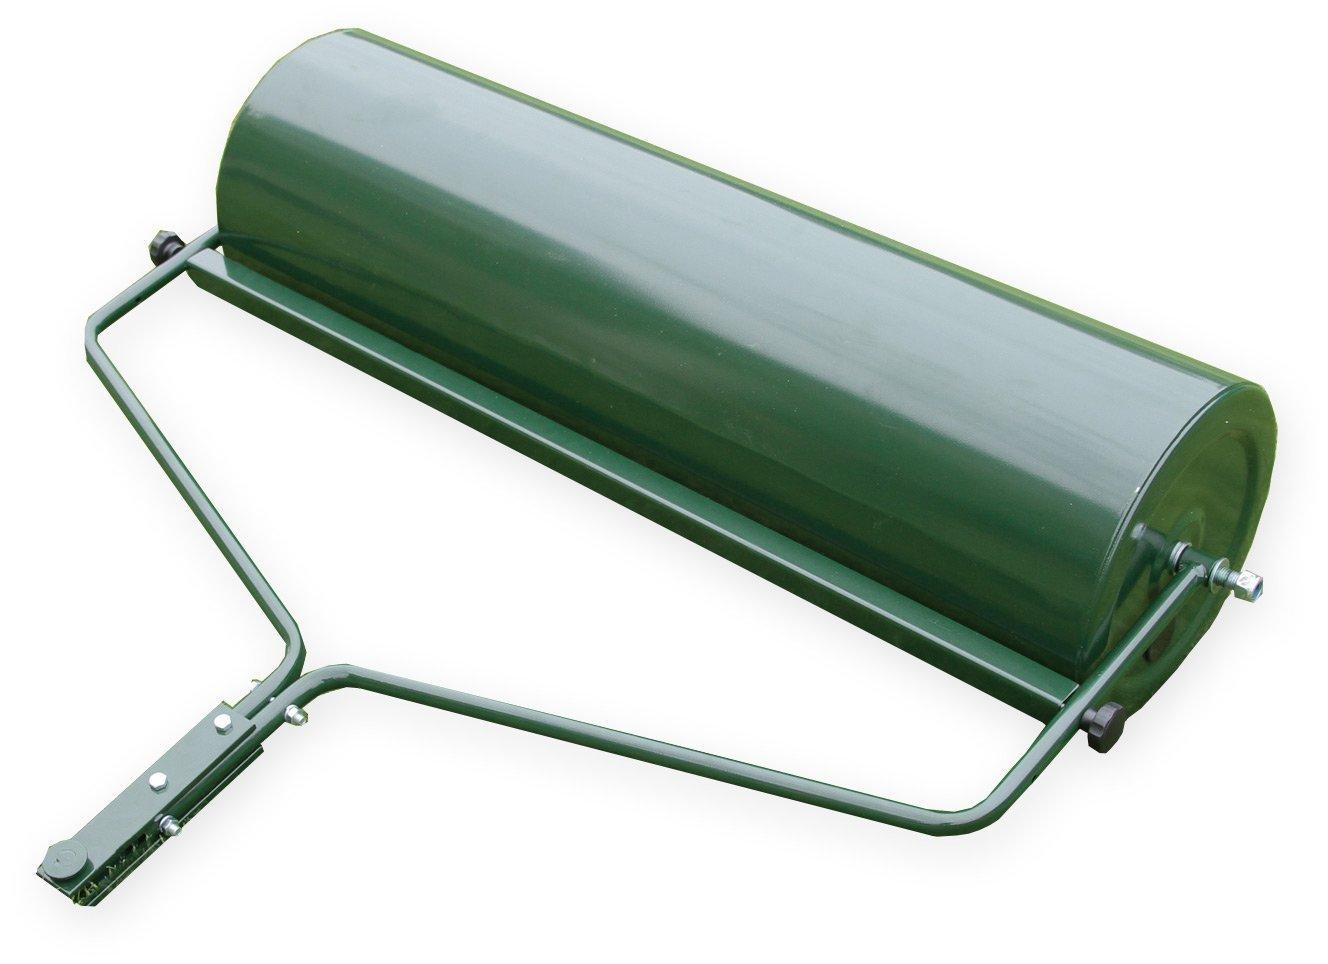 Gartenwalze Rasenwalze Rasenlüfter Handwalze Rasentraktor